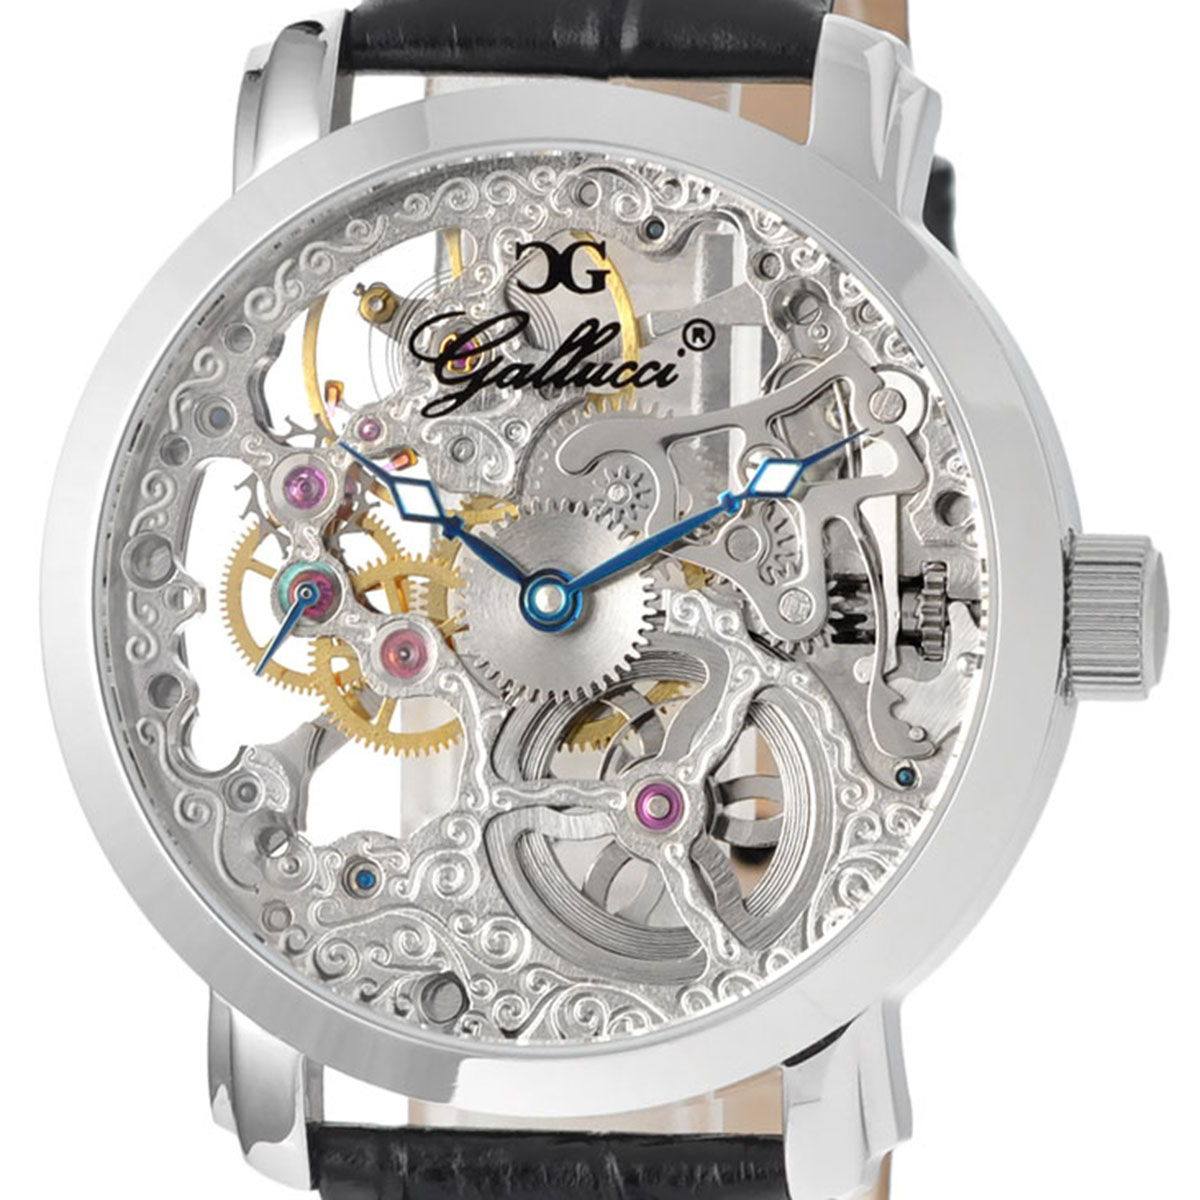 Gallucci ガルーチ 手巻き 腕時計 [WT22200SK-ST] 並行輸入品